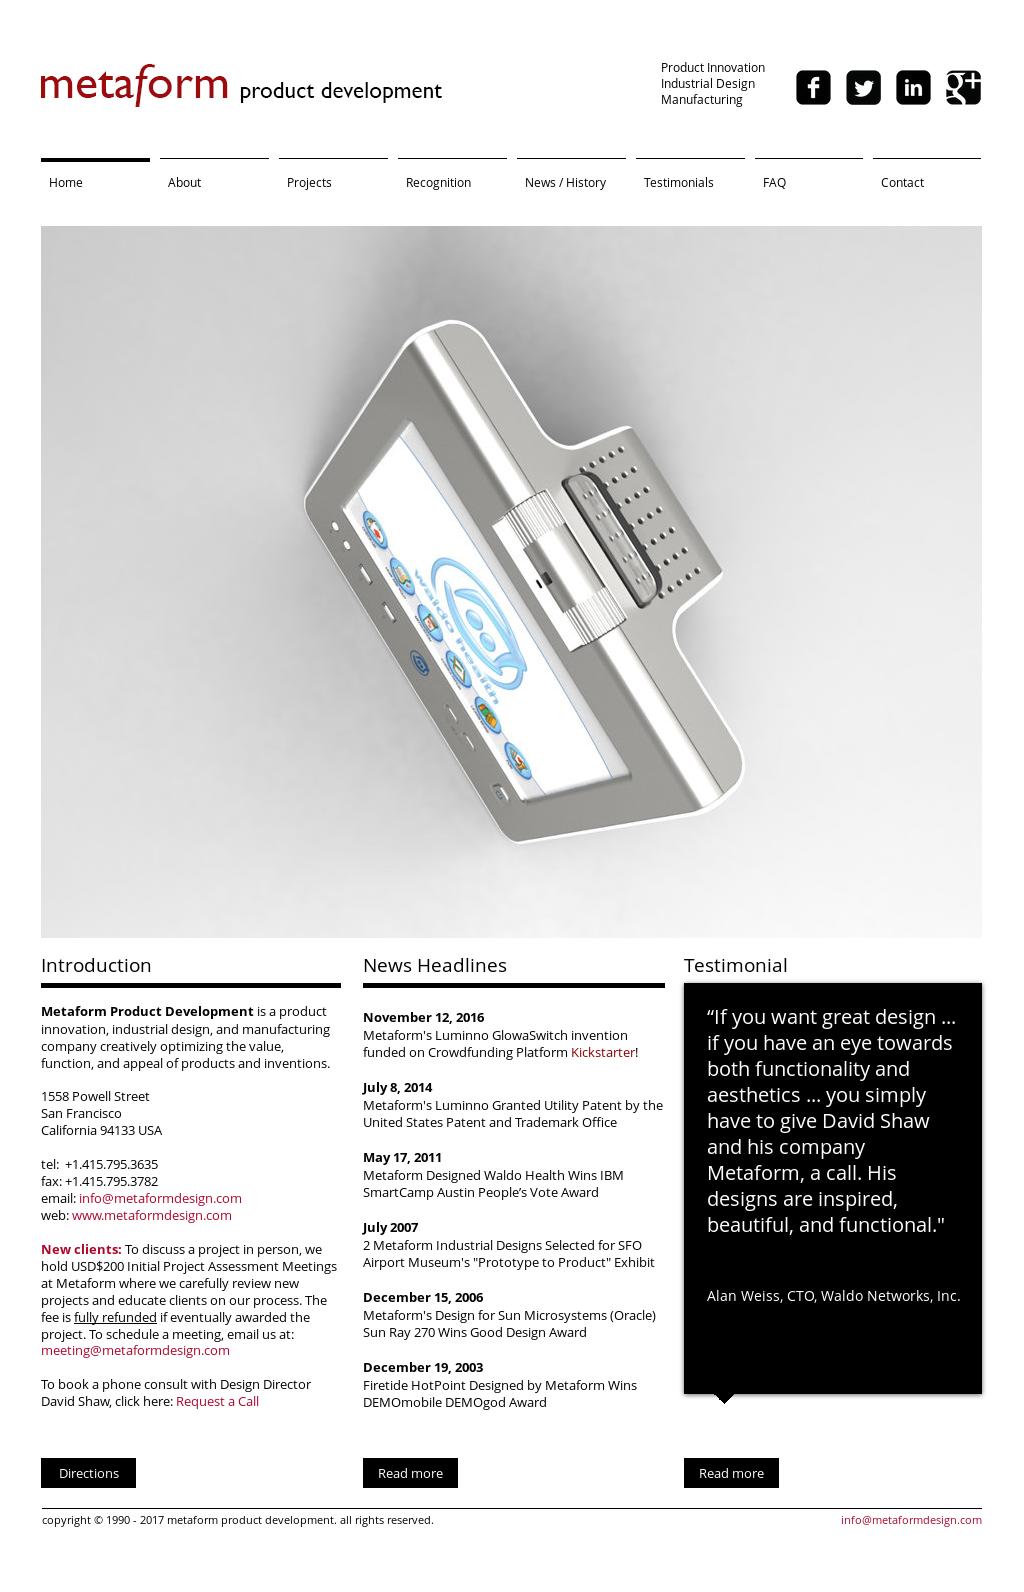 Metaformdesign Competitors, Revenue and Employees - Owler Company